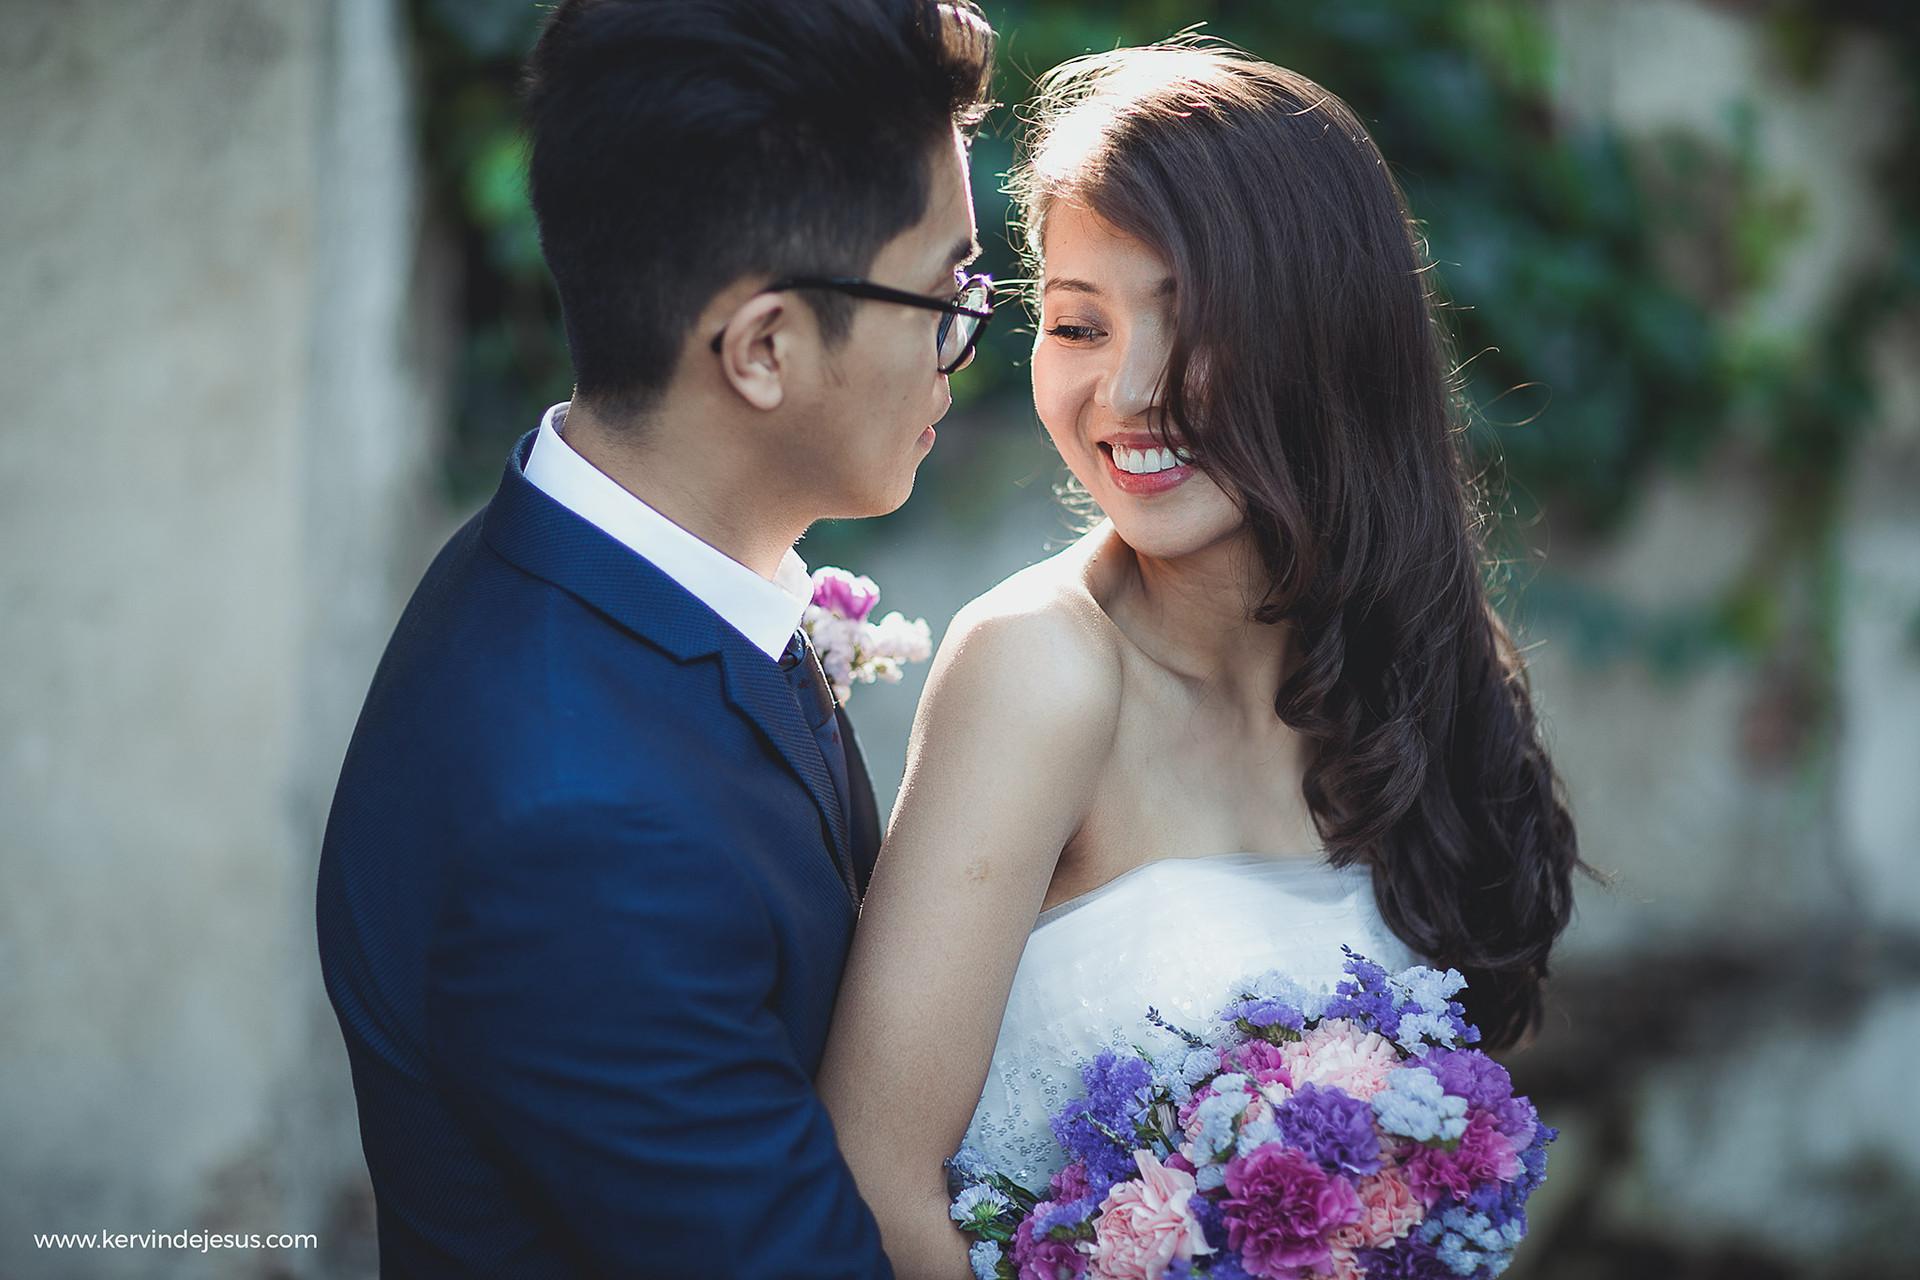 fcs_yovannenorman_wedding12.jpg